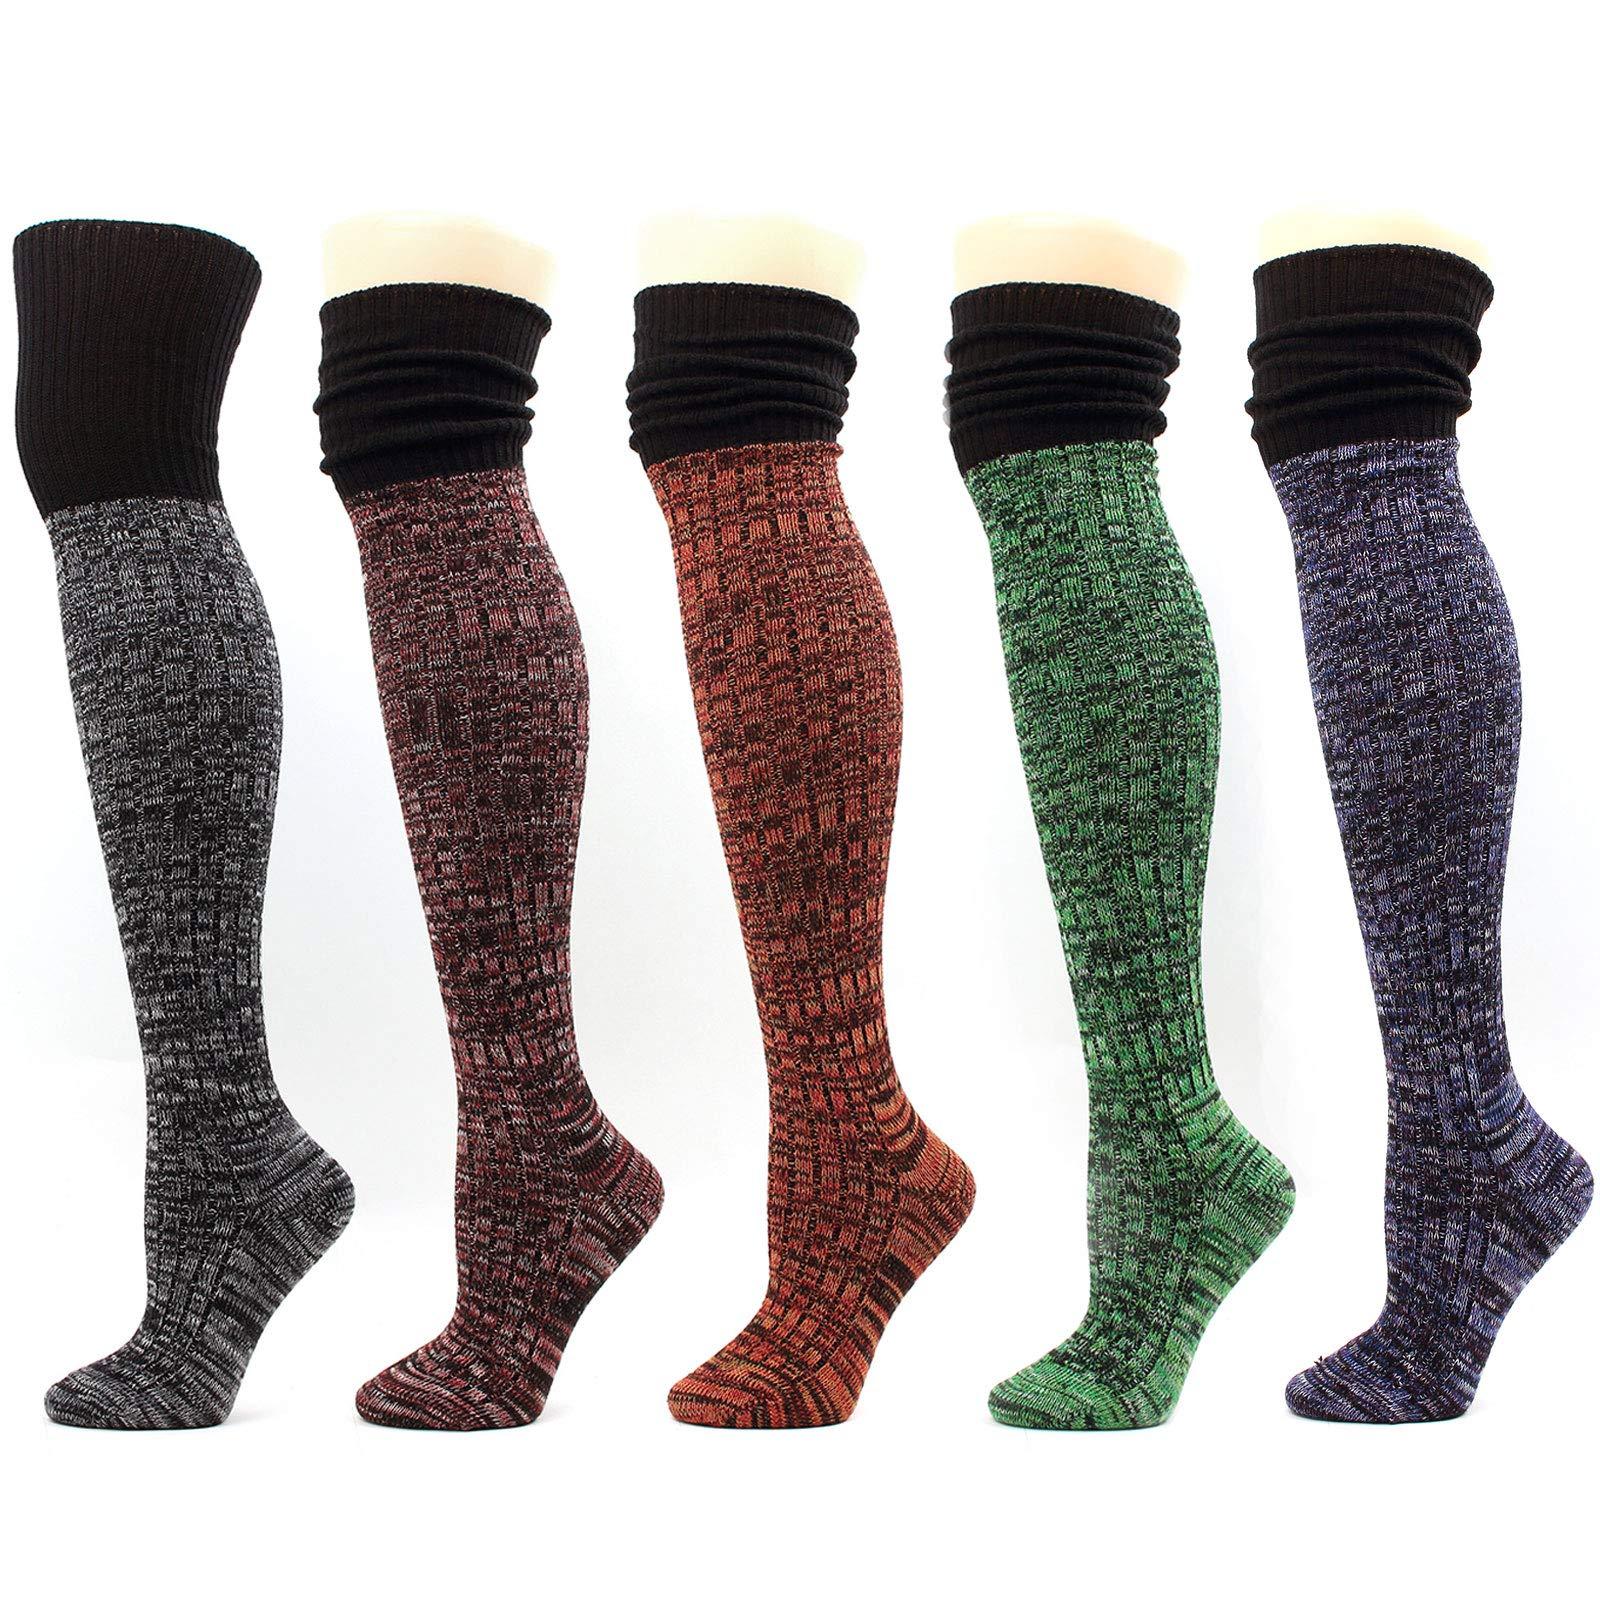 Women Over-The-Knee Thigh High Socks Leg warmer Knit Winter Leggings (A-Multi Pack 5pairs)